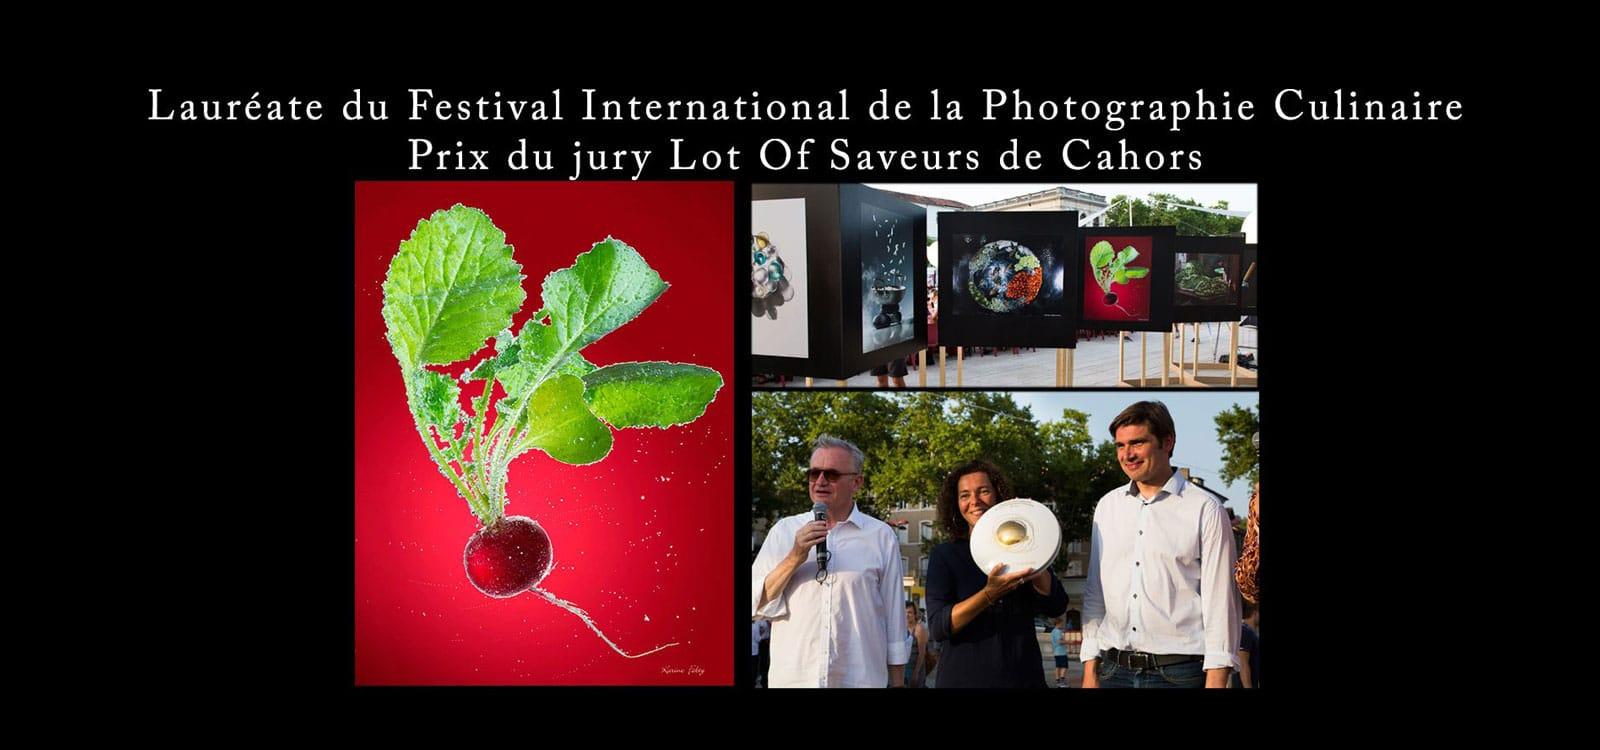 Karine Faby photographe culinaire